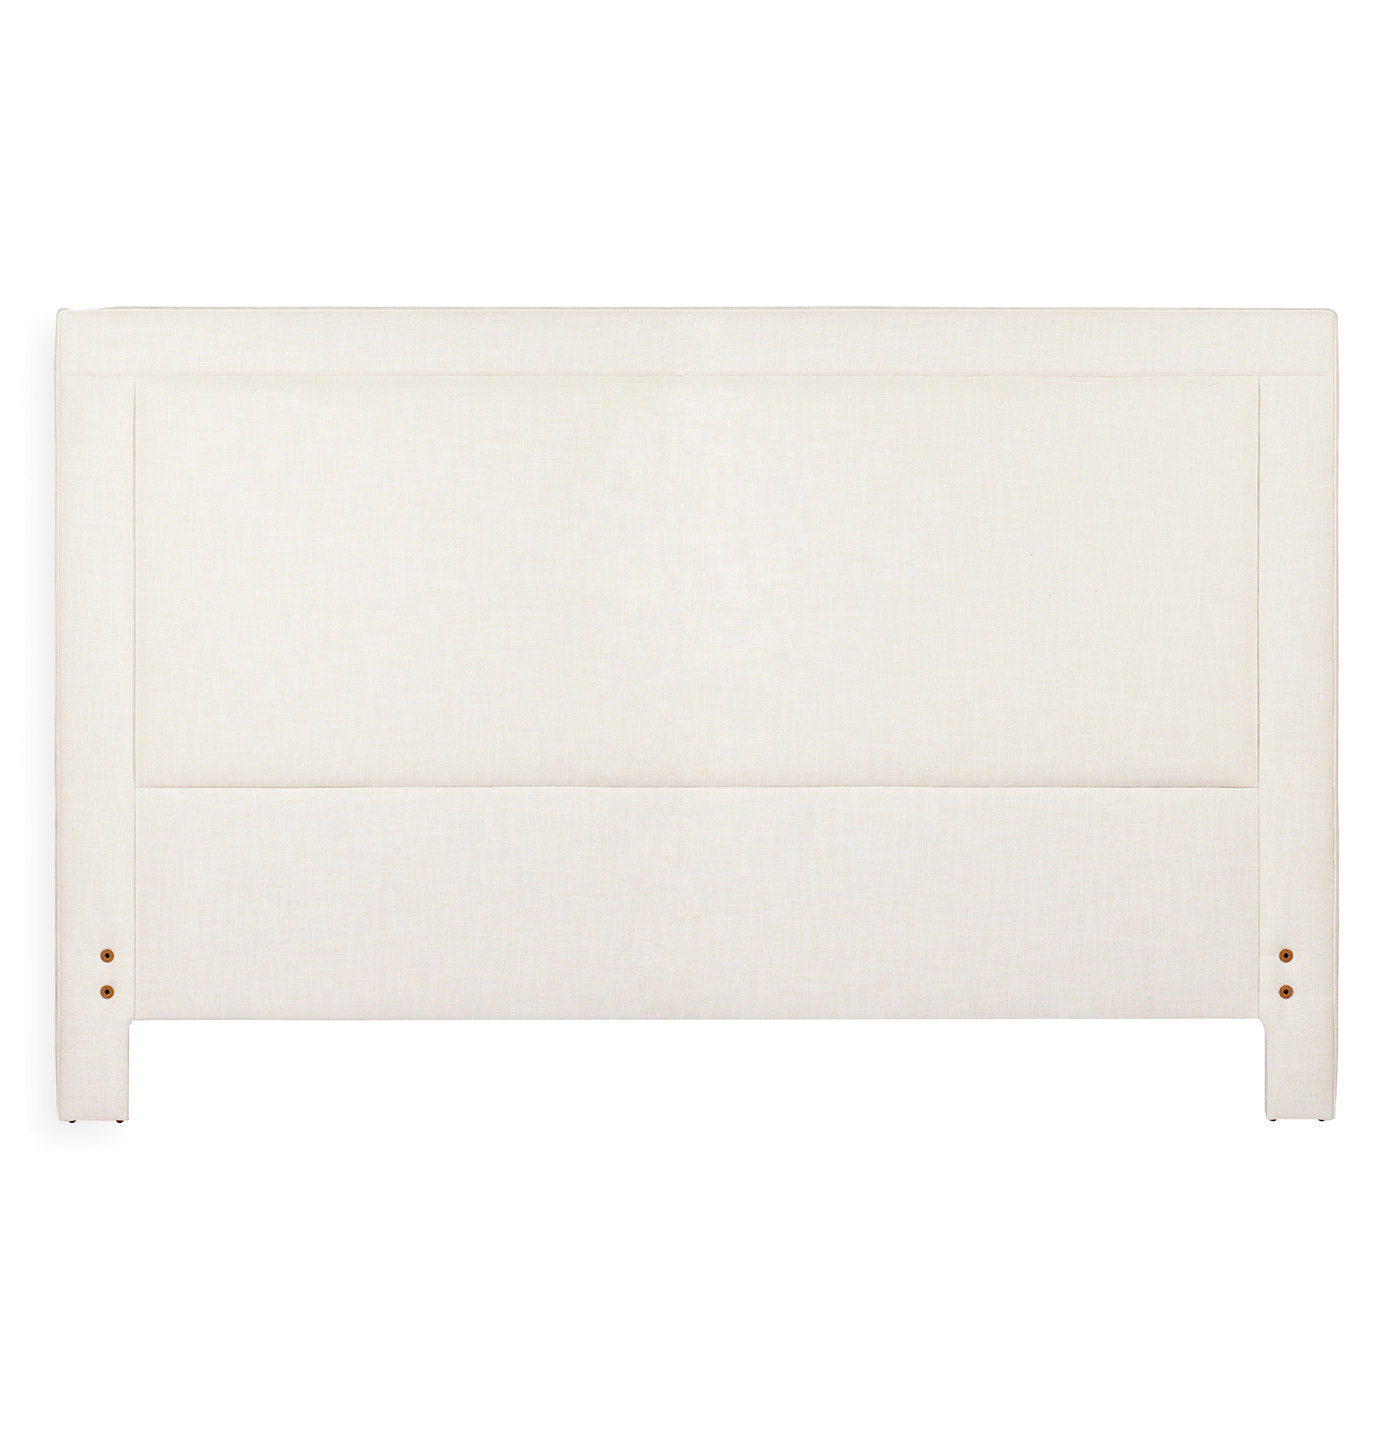 Sloan Modern Classic Square Banded Ivory Linen Headboard- King